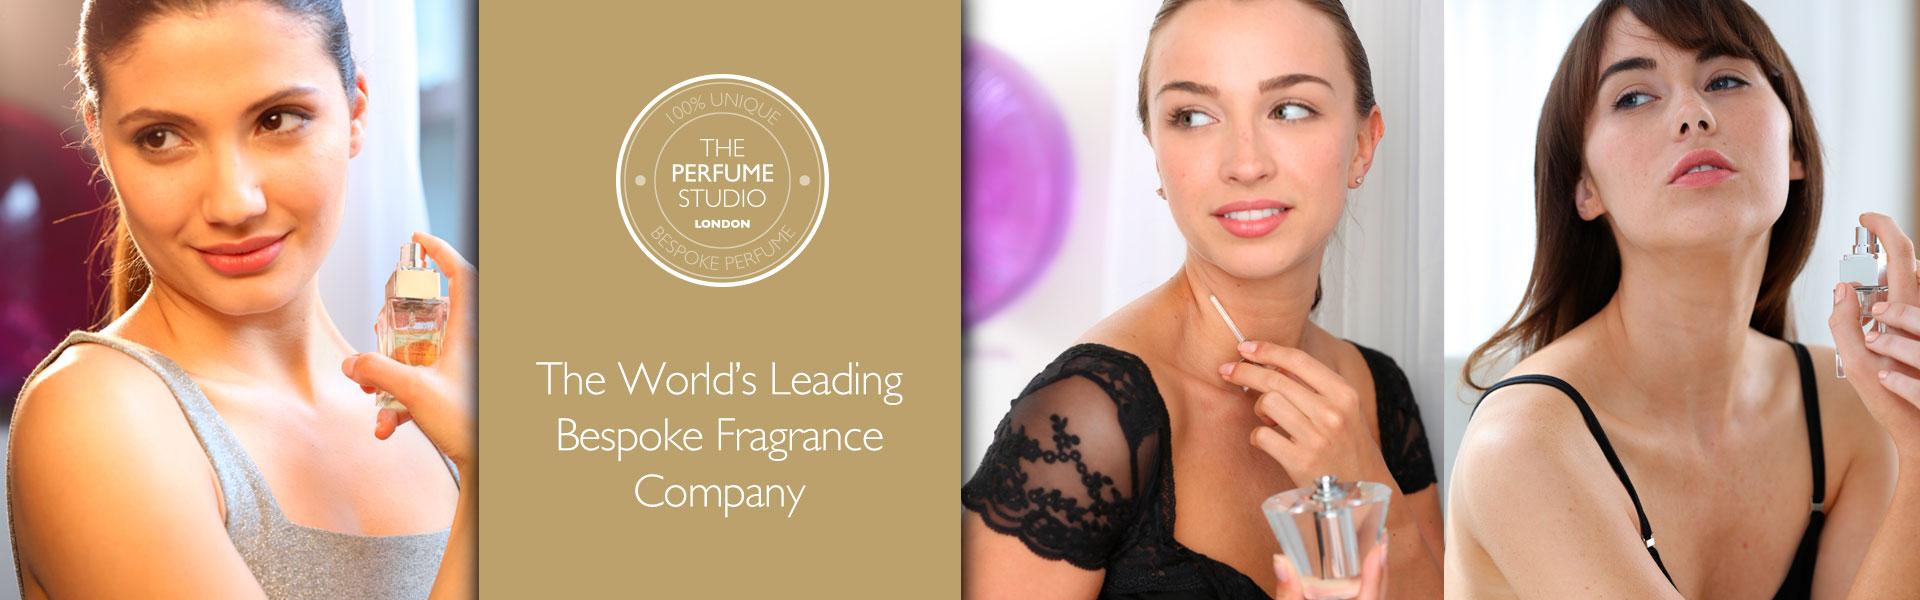 The World's Leading Bespoke Fragrance Company